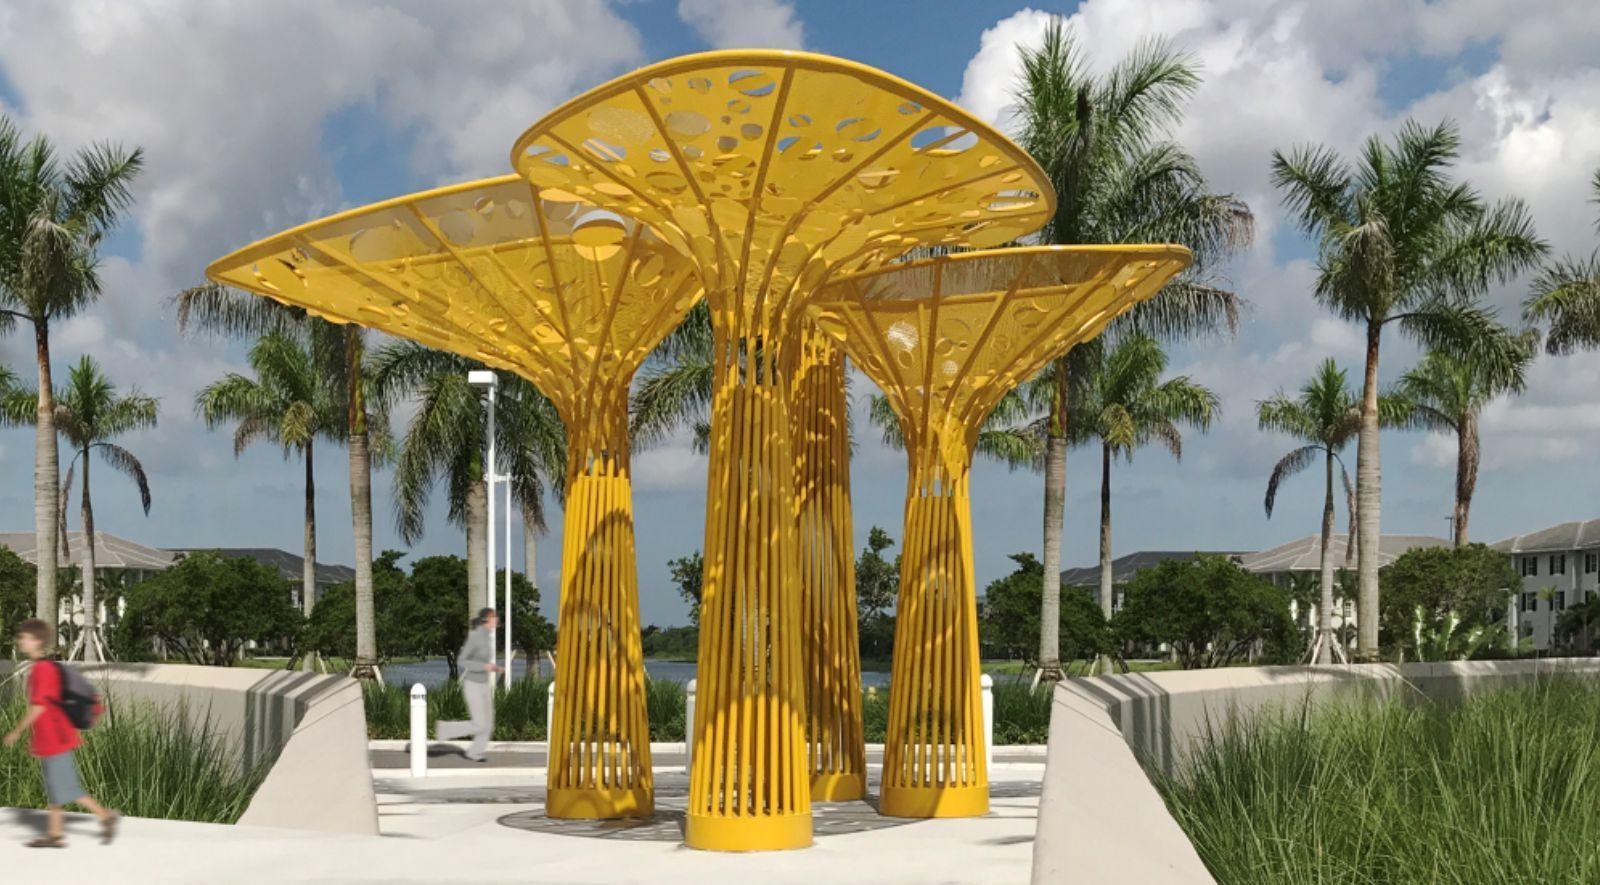 Real Estate in Pembroke Pines Florida